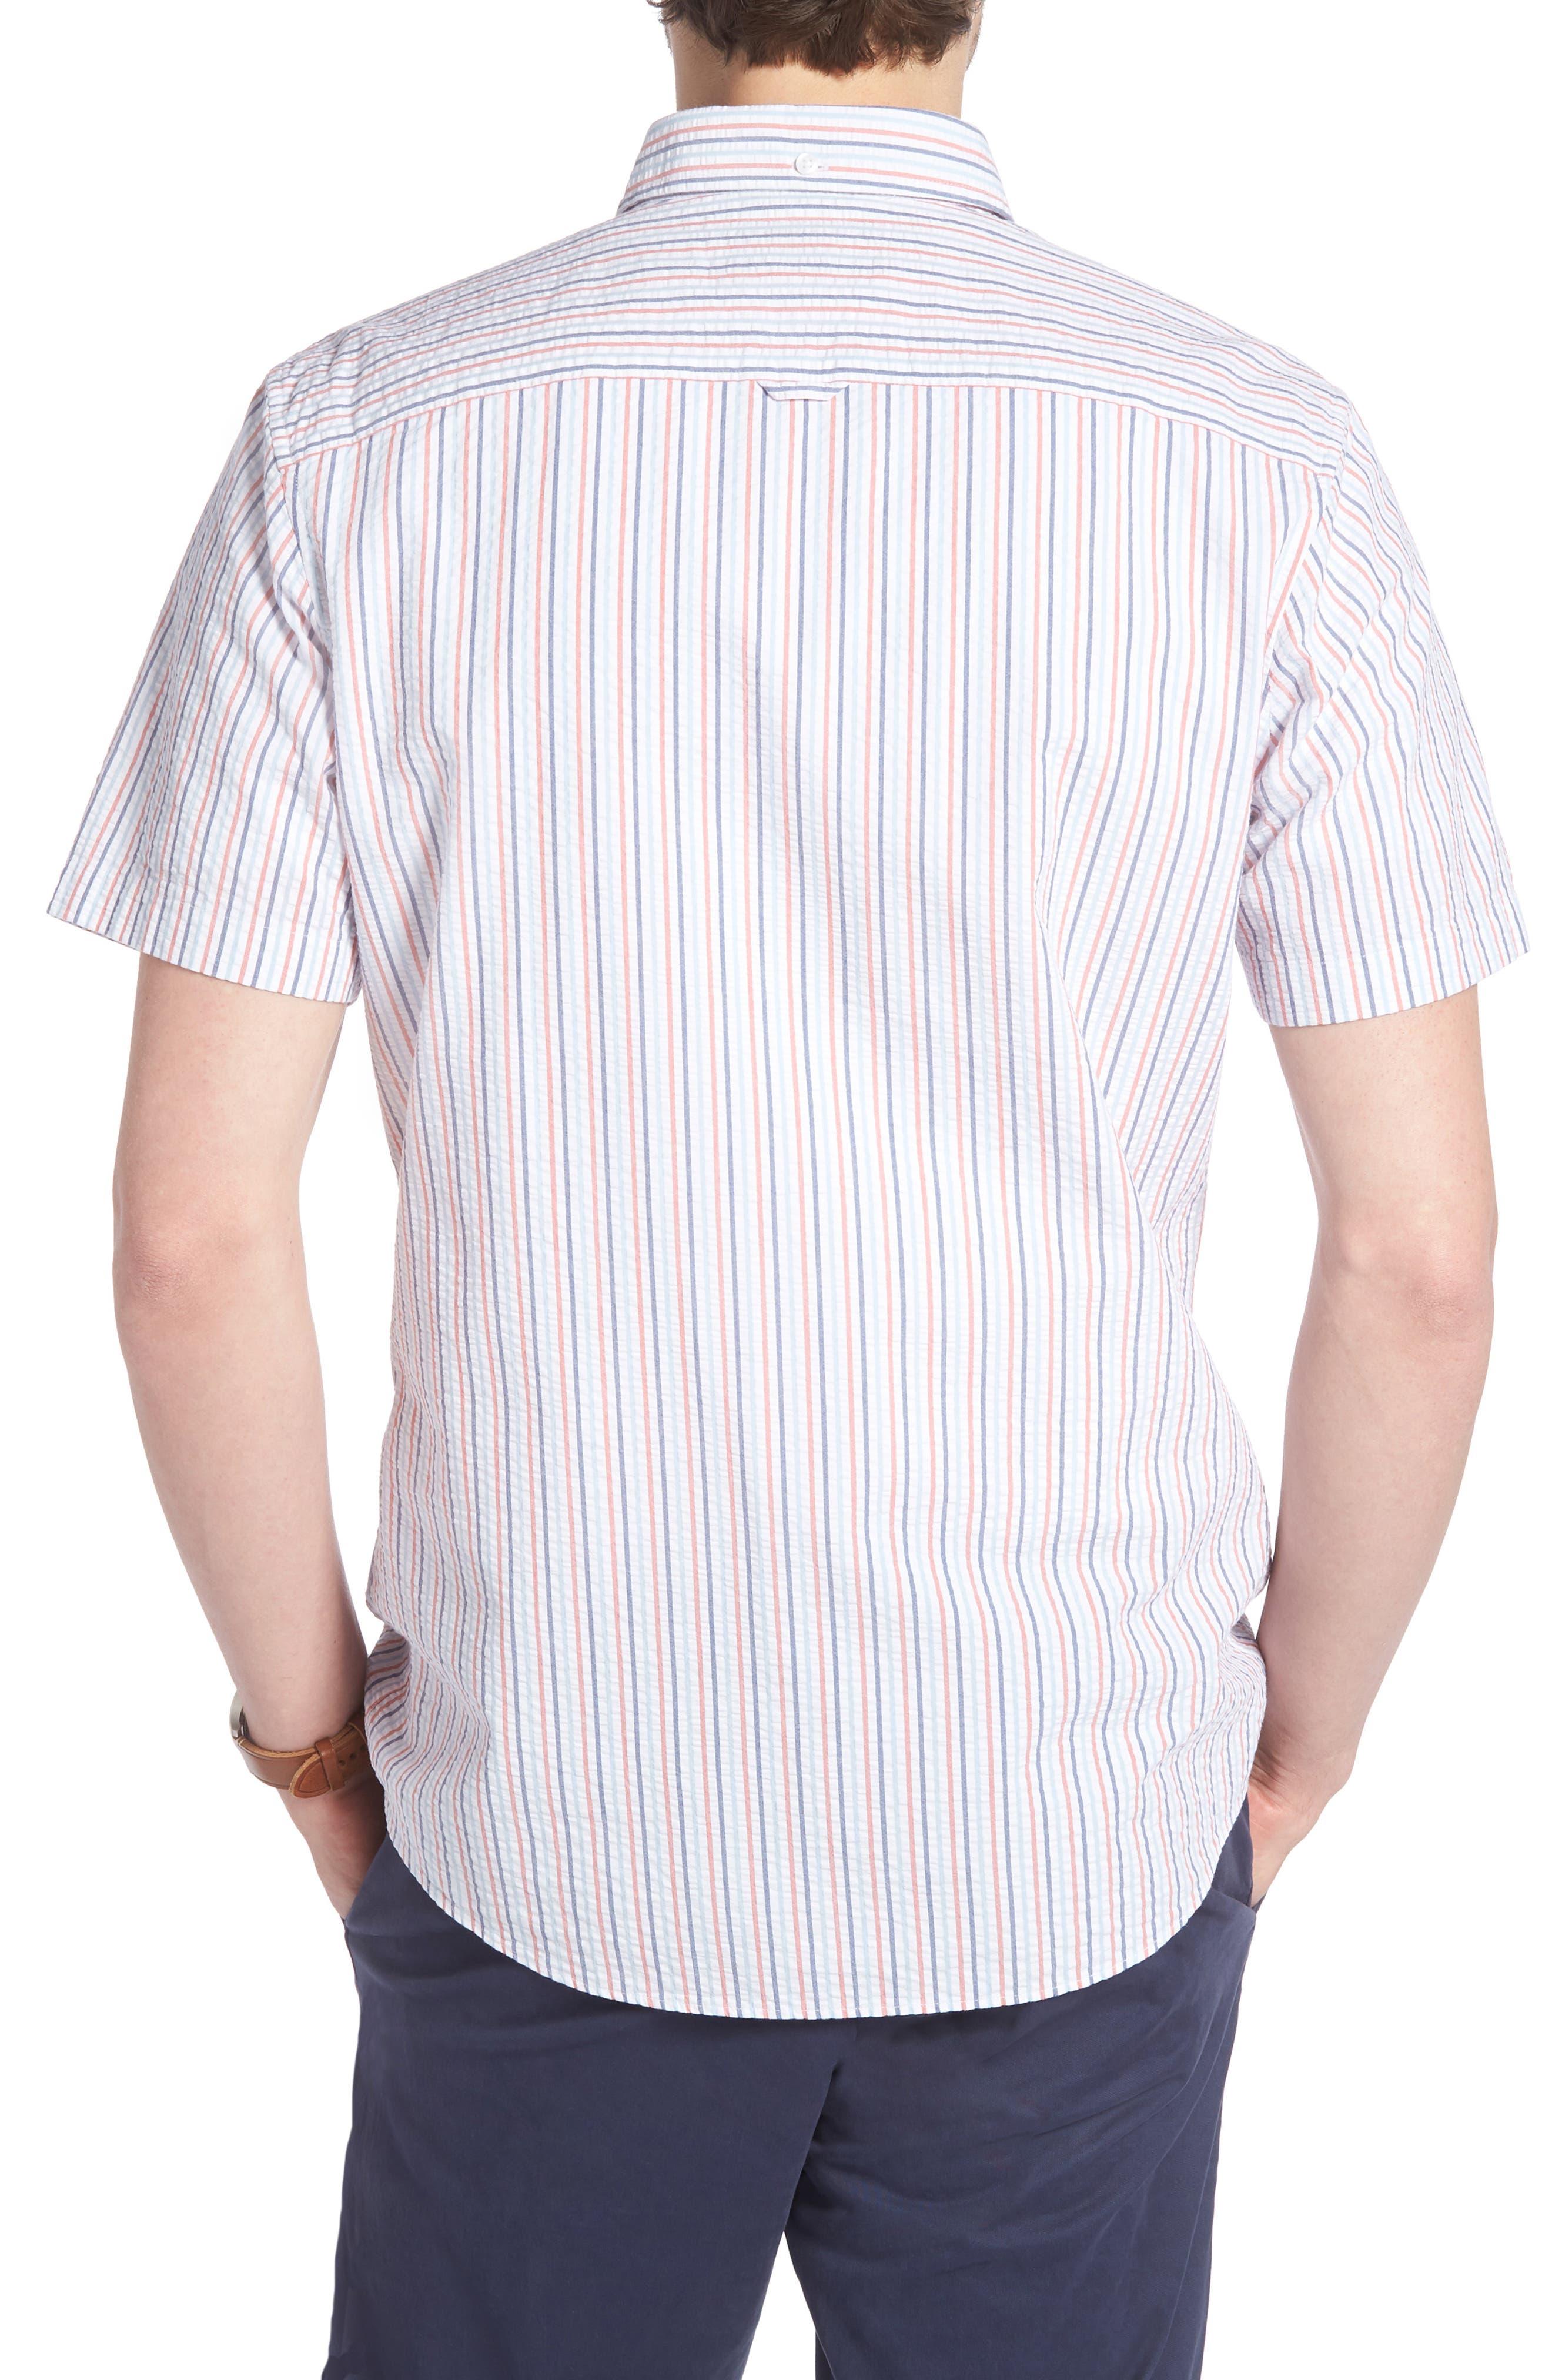 Trim Fit Seersucker Short Sleeve Sport Shirt,                             Alternate thumbnail 3, color,                             White Multi Pencil Stripe